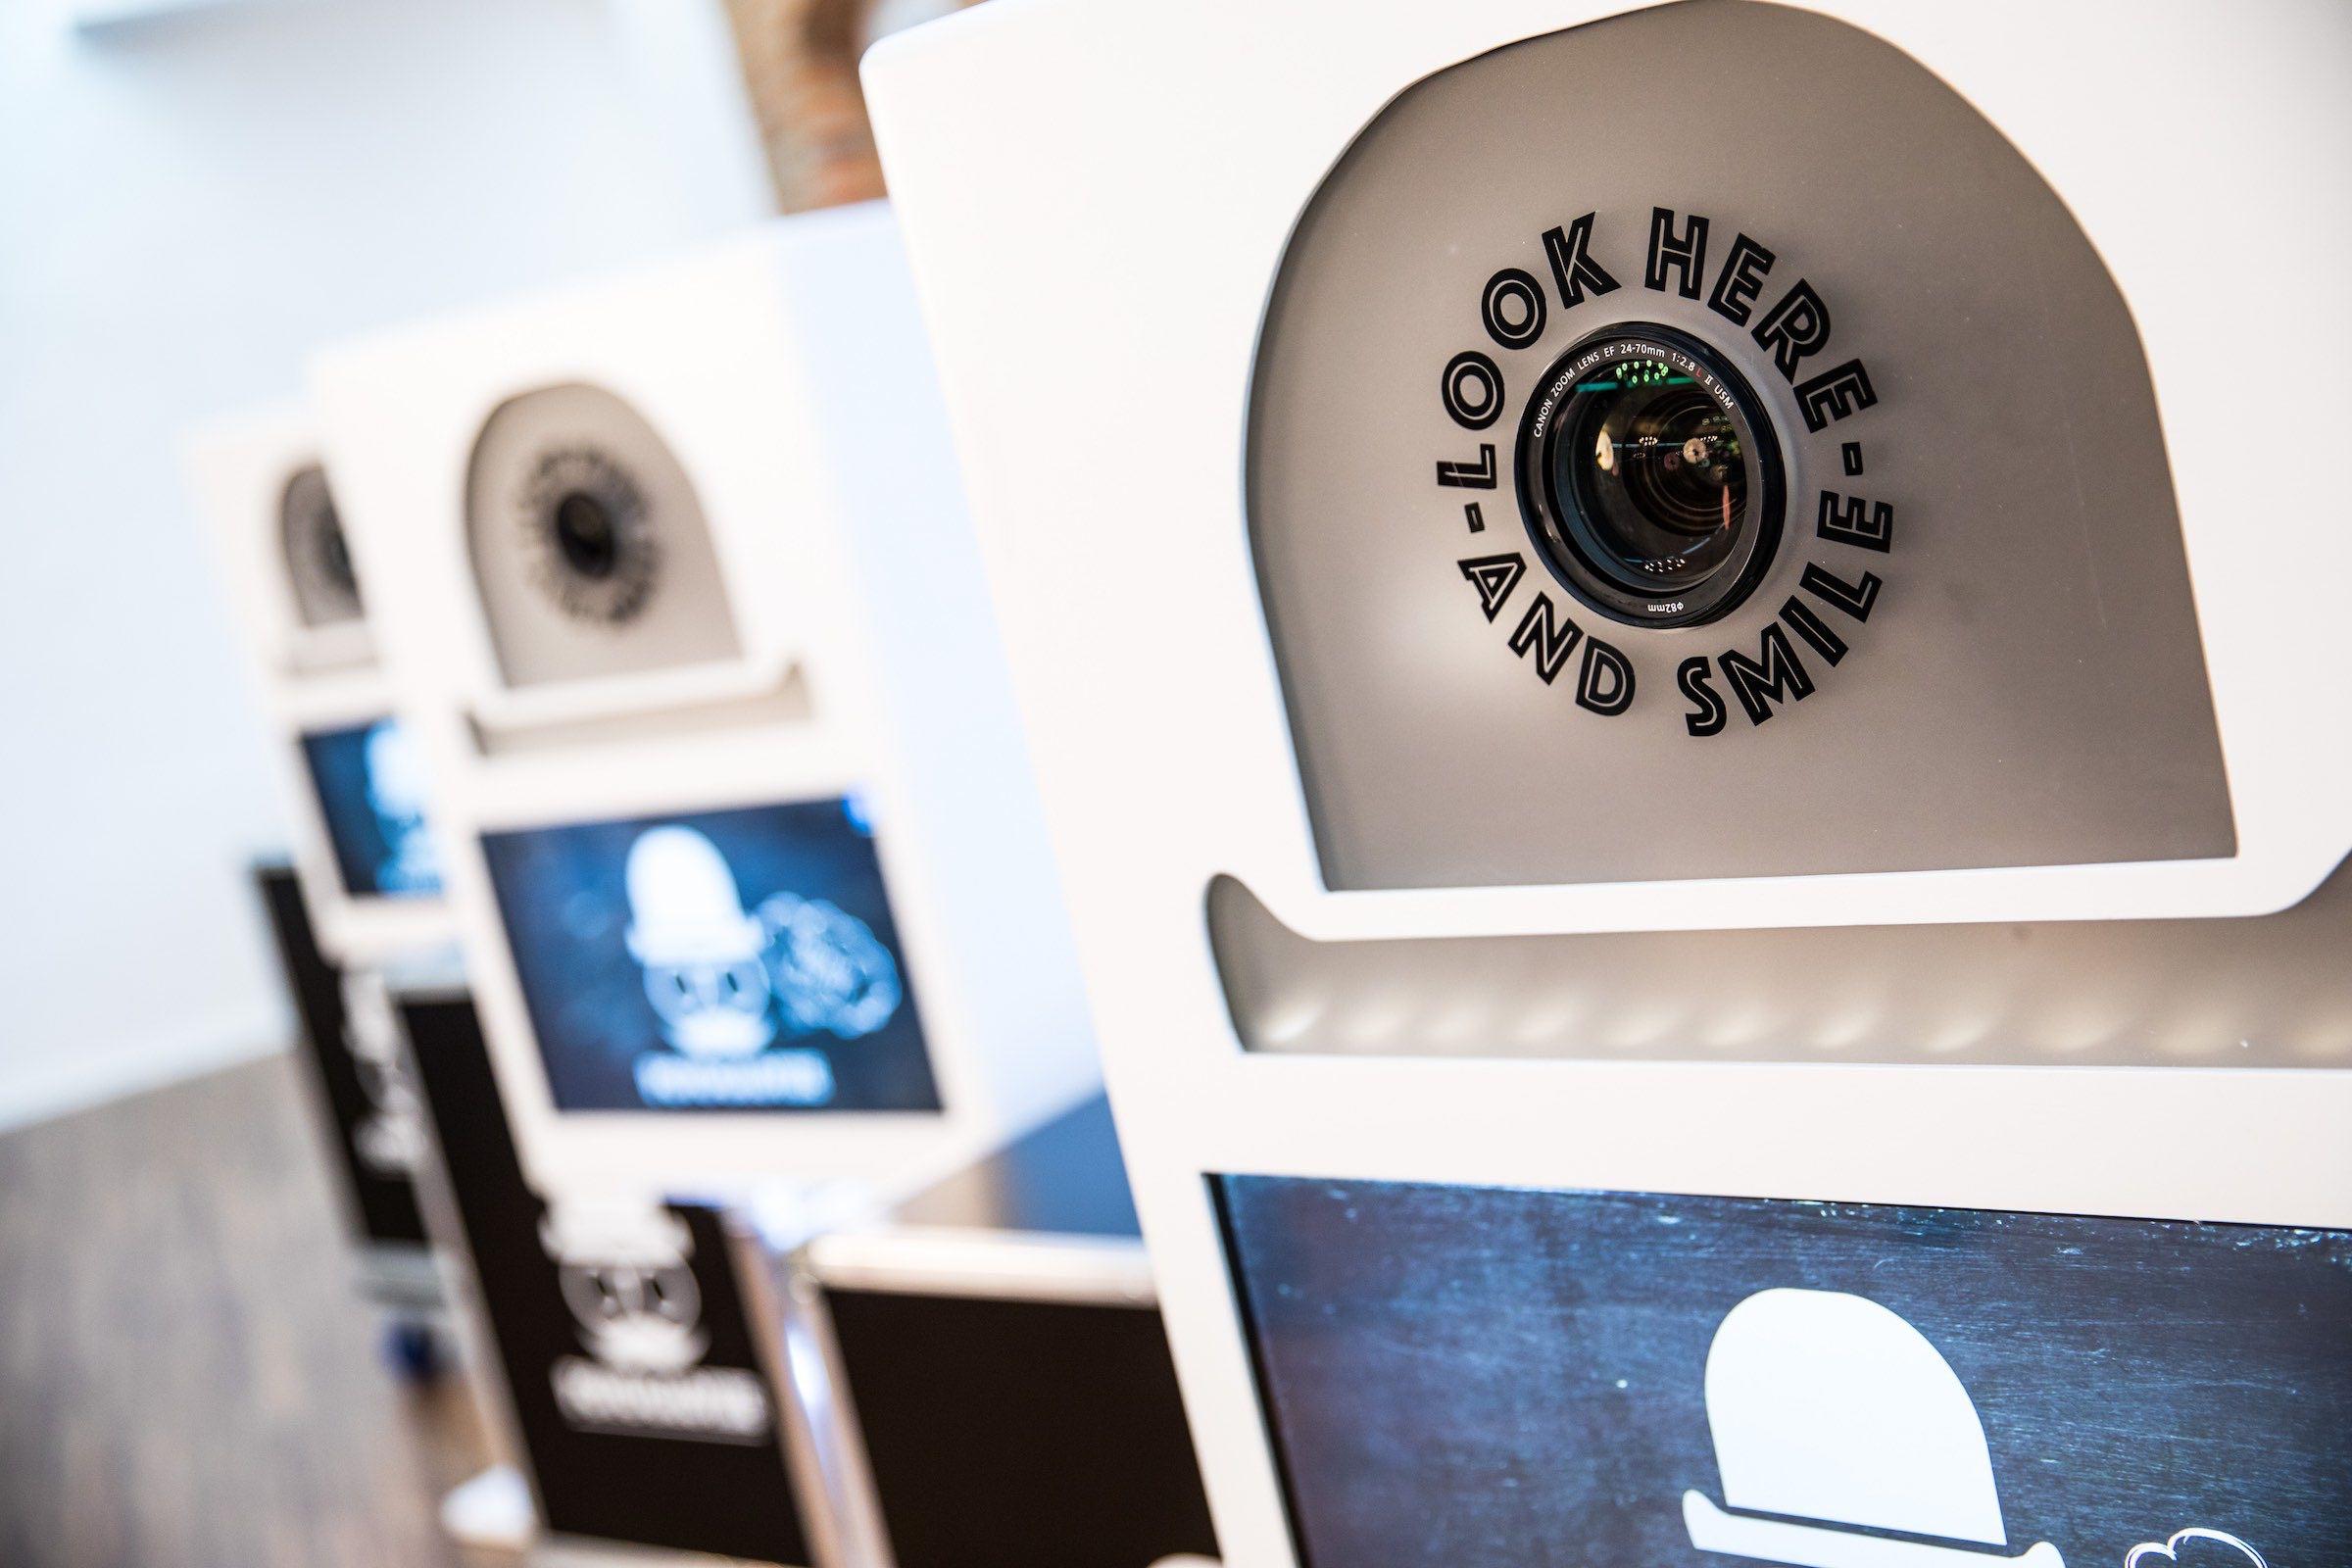 Fotobox | Photobooth | Hamburg | Fotokiste | Fotoglotze | Fotoautomat | Passfoto | Verkleidung | Hannover | Hochzeit | Messe | Geburtstag | Firmenfeier | Selfiebox | Mieten | Buchen | Hamburgfeiert